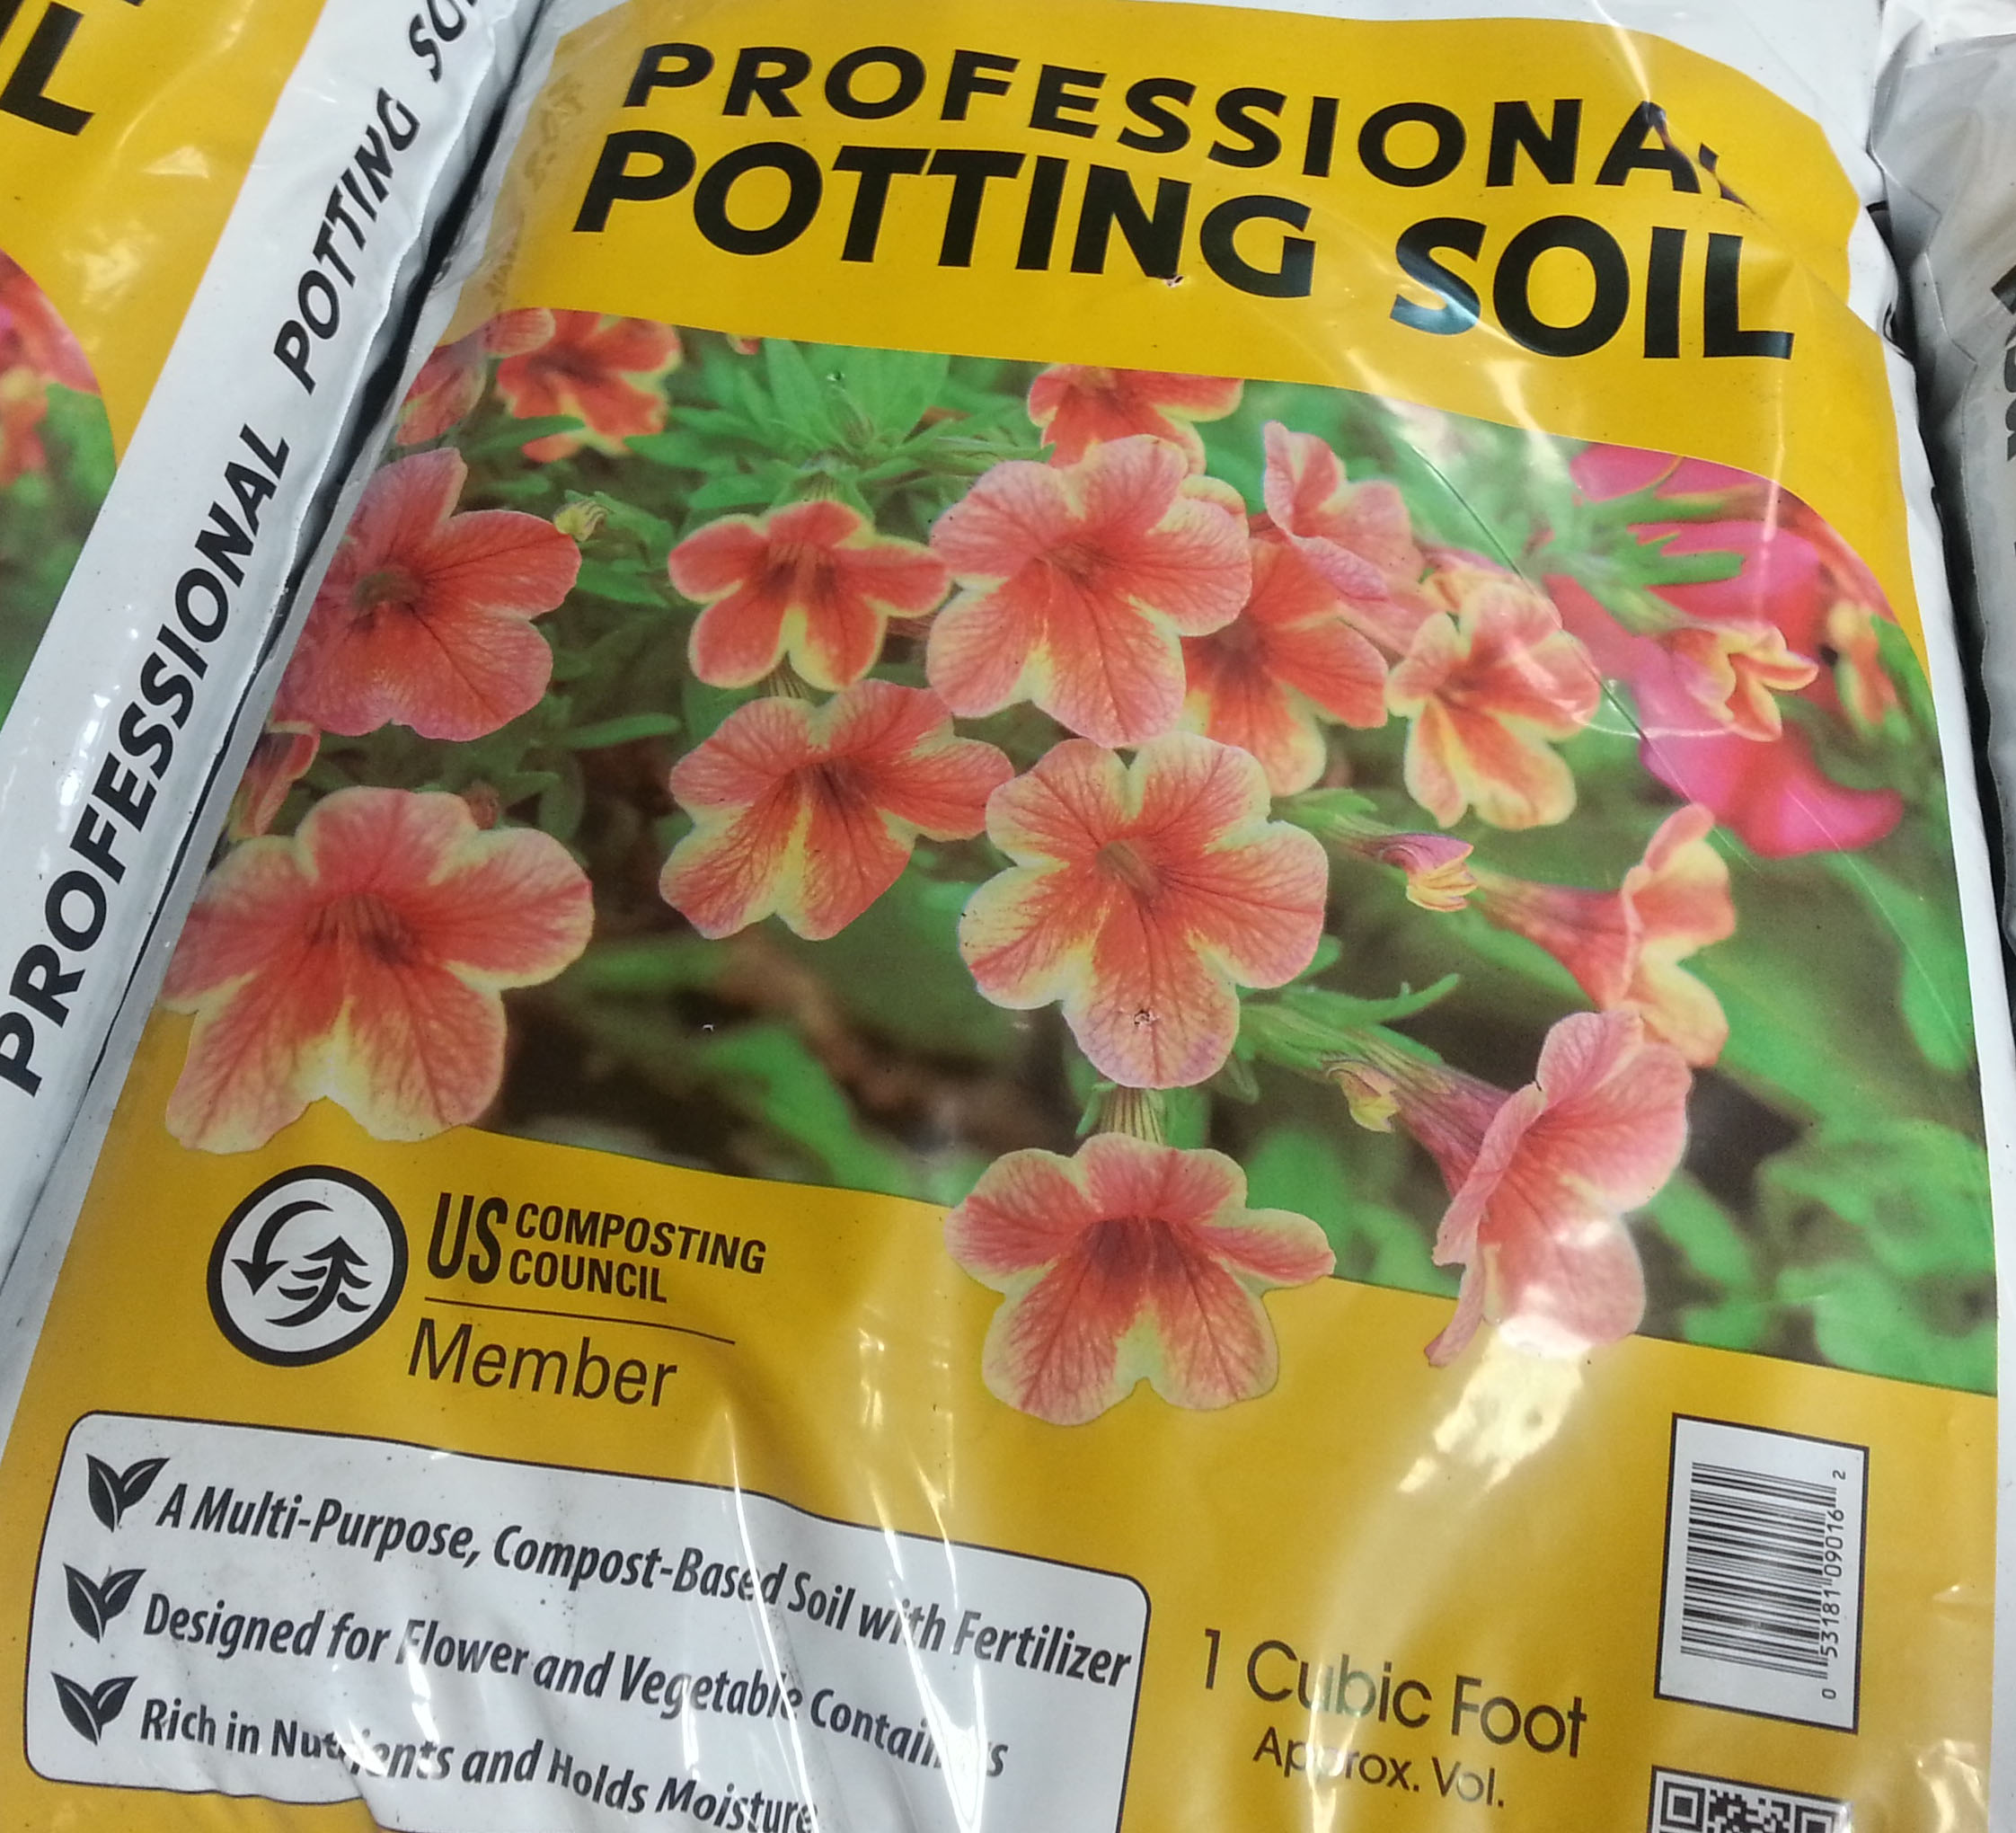 Super potting soil! Organic, healthy nutrients, moisture holding!